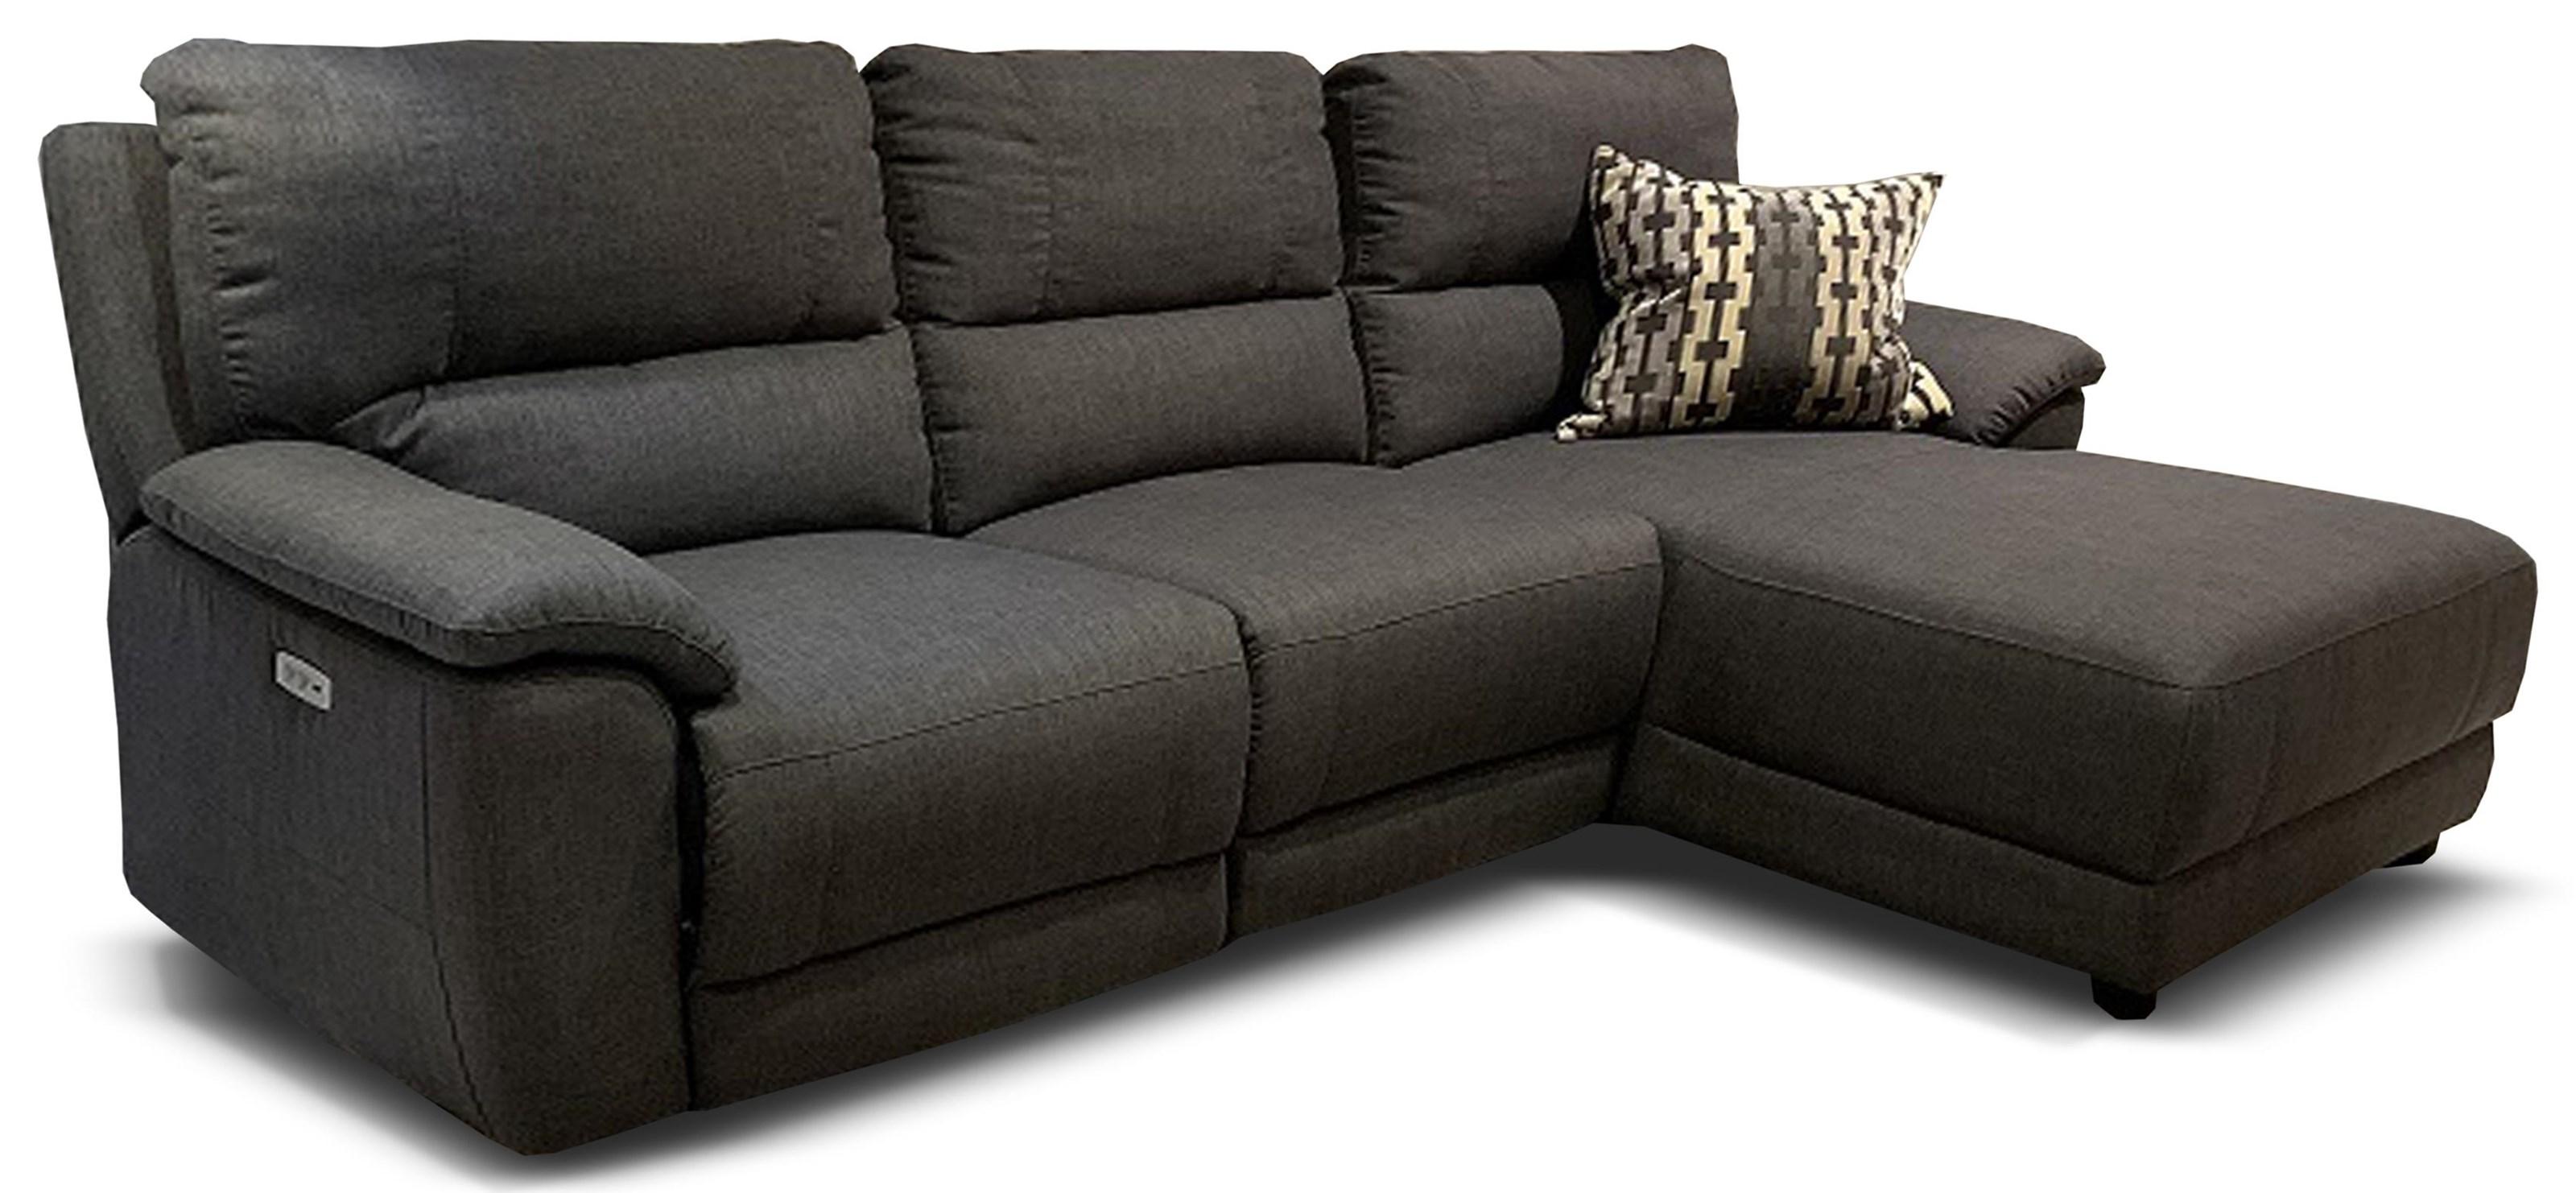 cullen cullen power sofa chaise